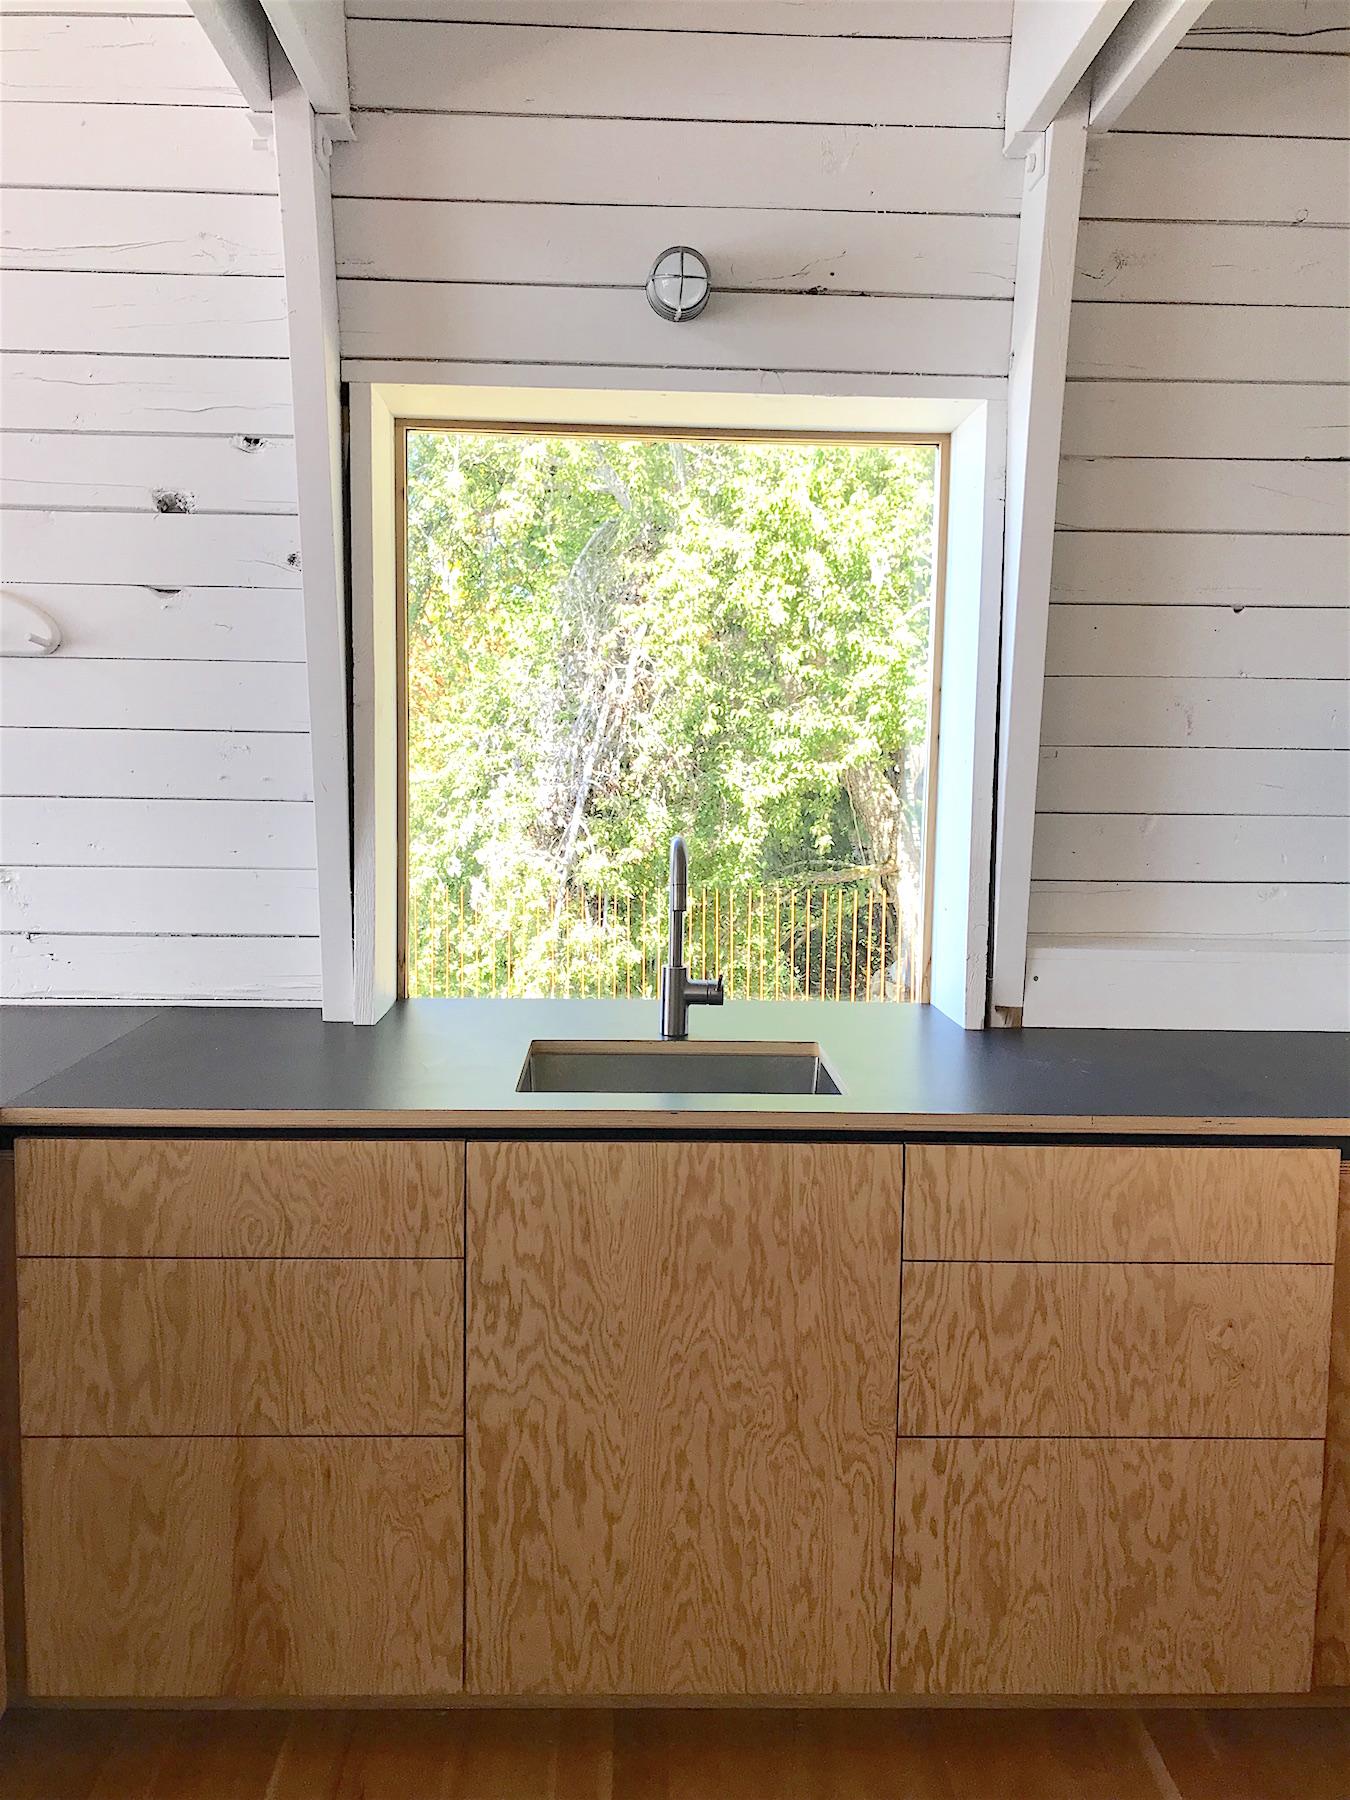 Kitchen sink V - 21455 Porlier Pass.jpeg